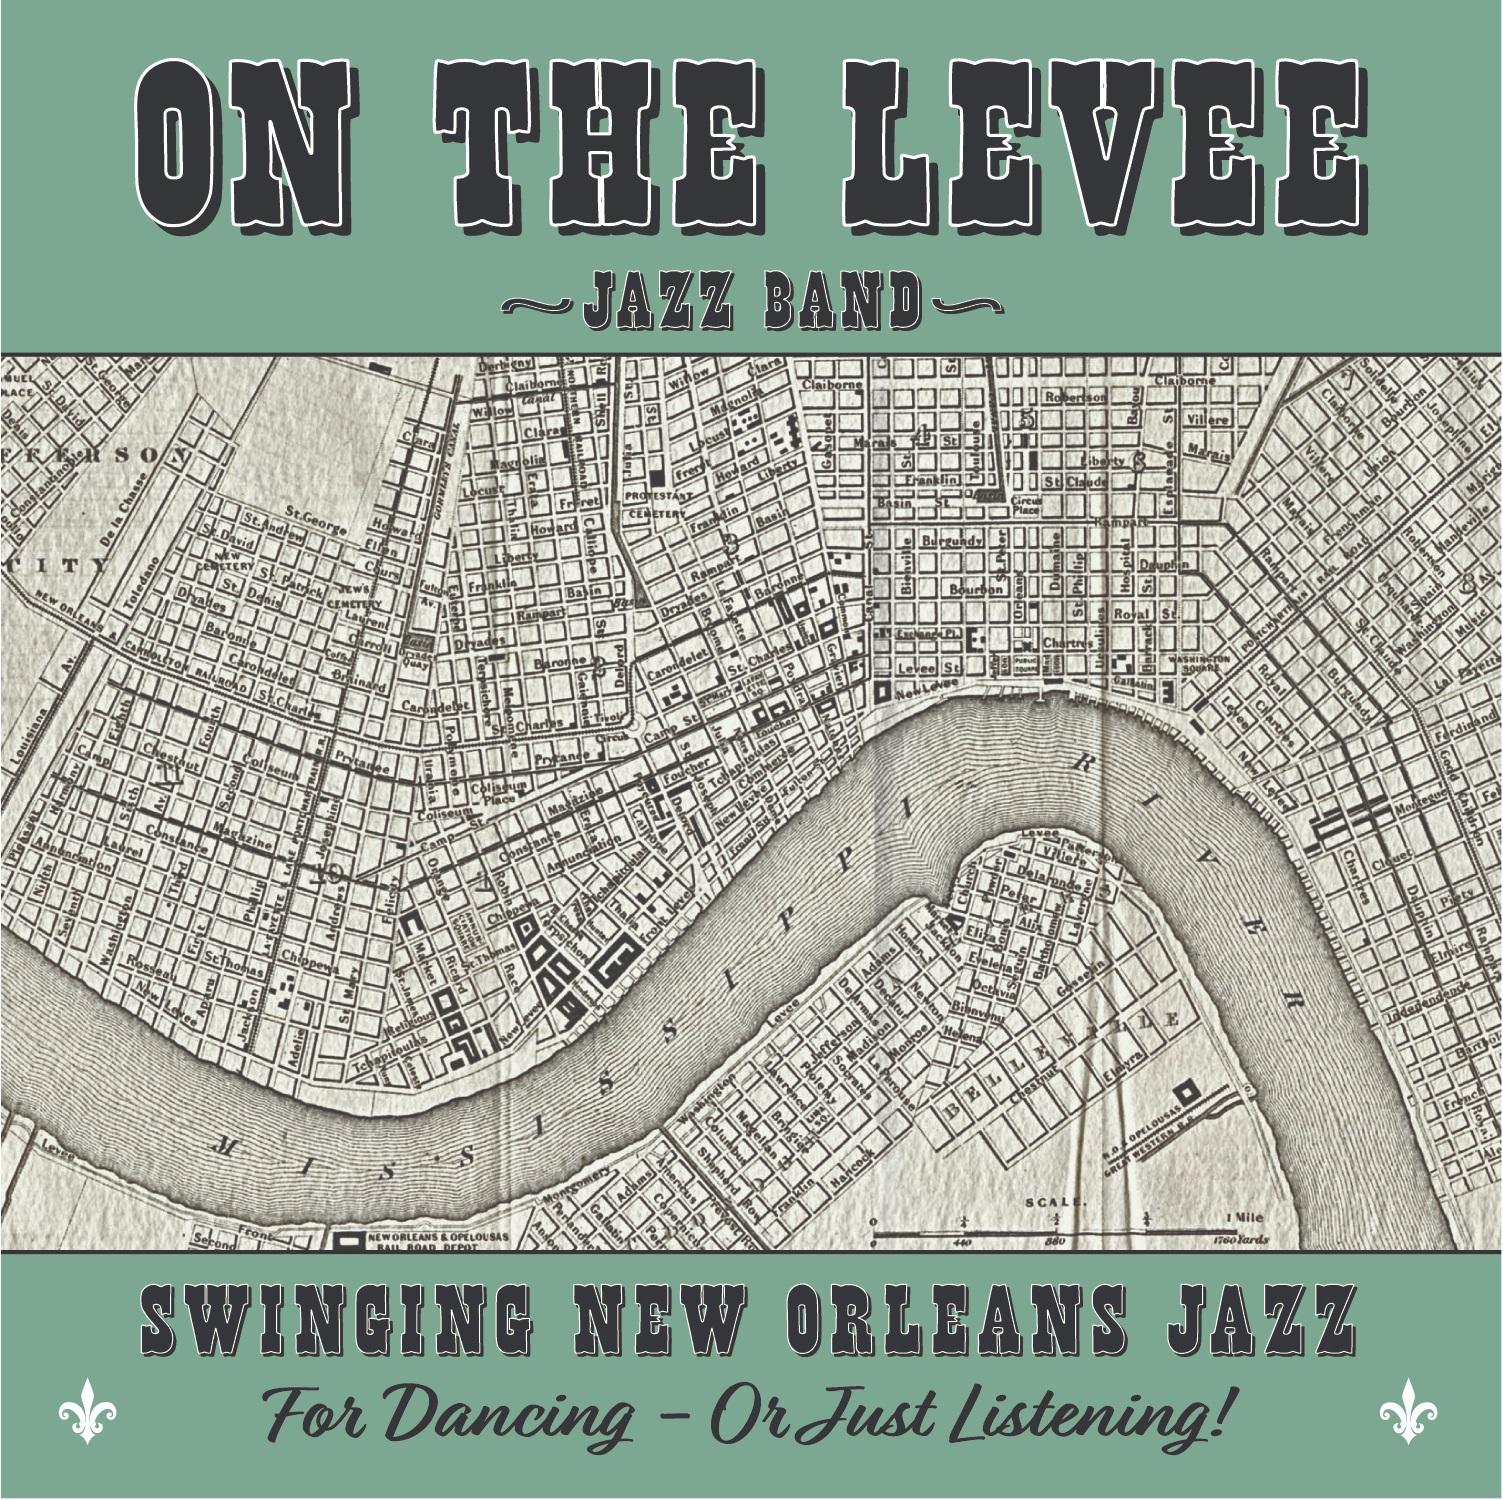 on-the-levee-jazz-band-music-listening-dancing-Joshua-Gouzy-discography-.jpg